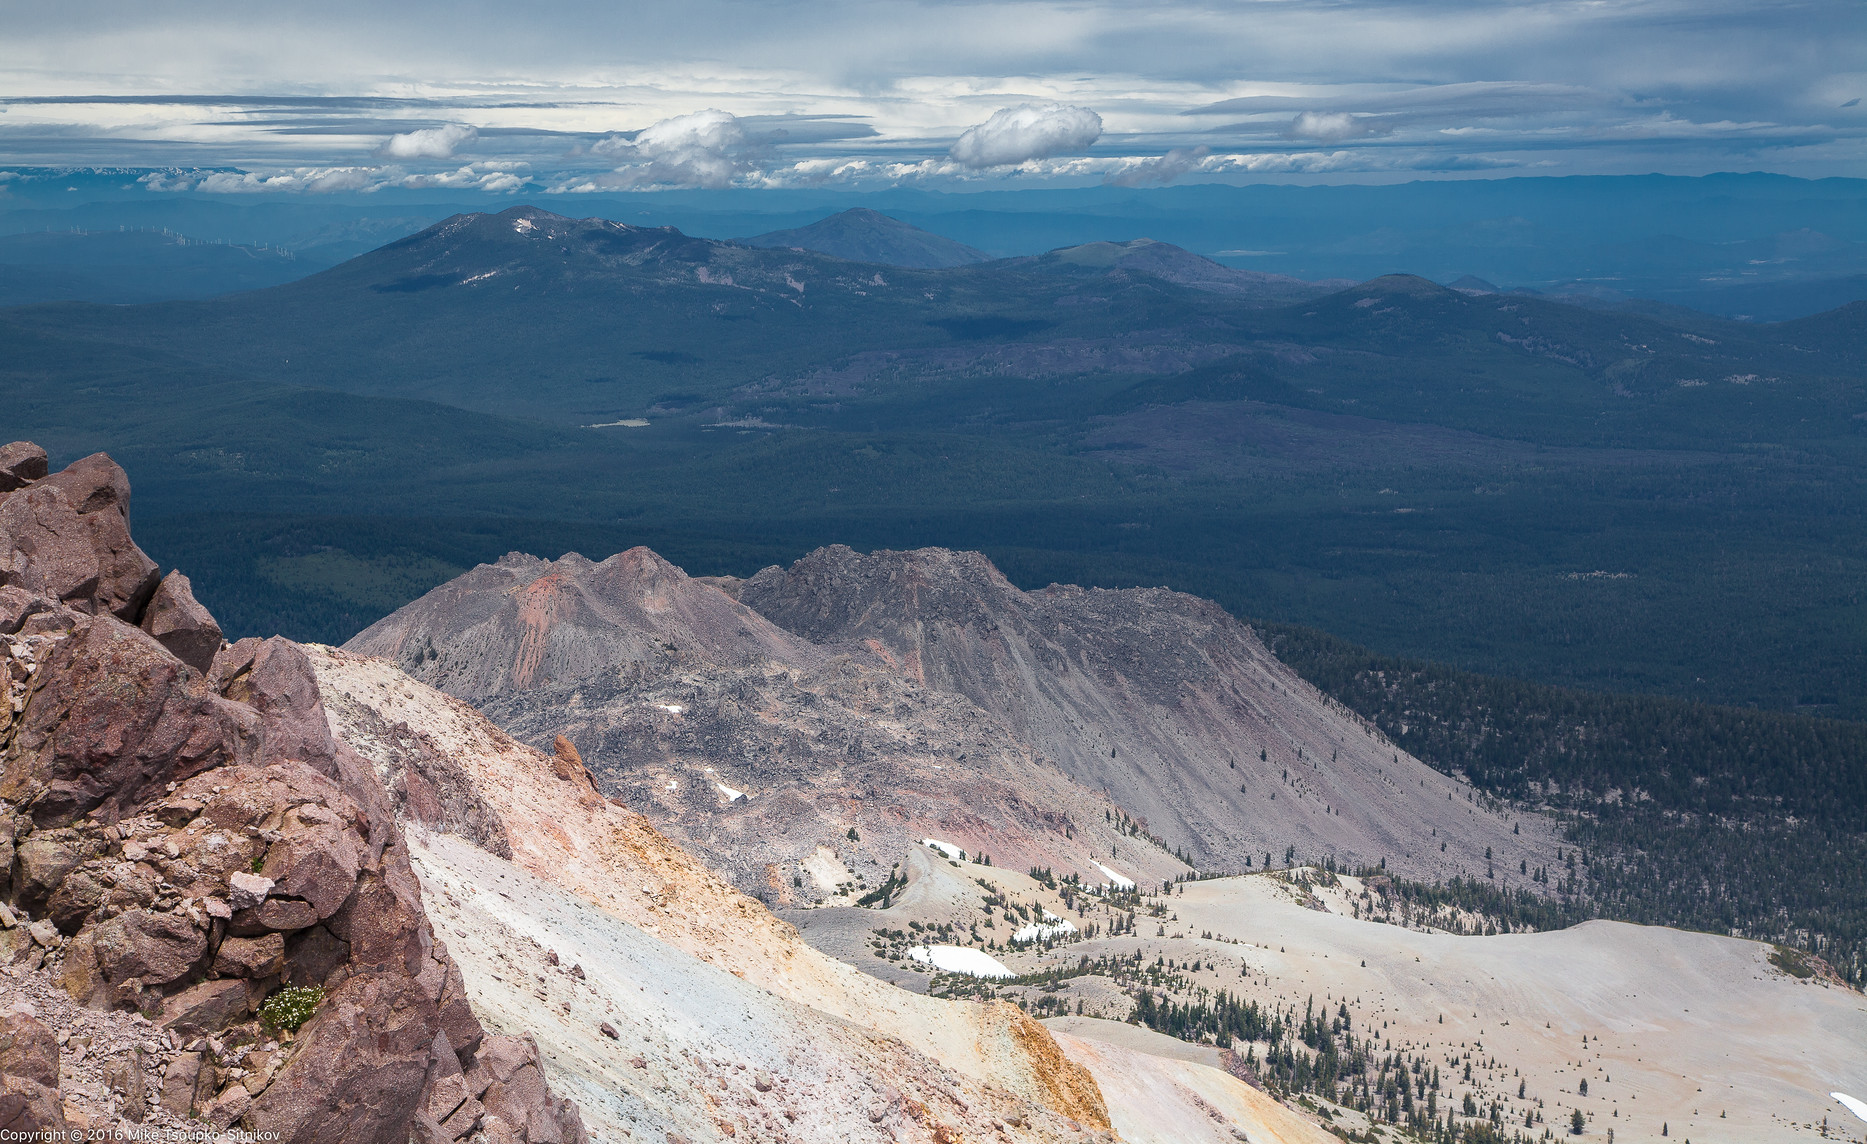 Lassen Peak. Looking eastwards from the summit.